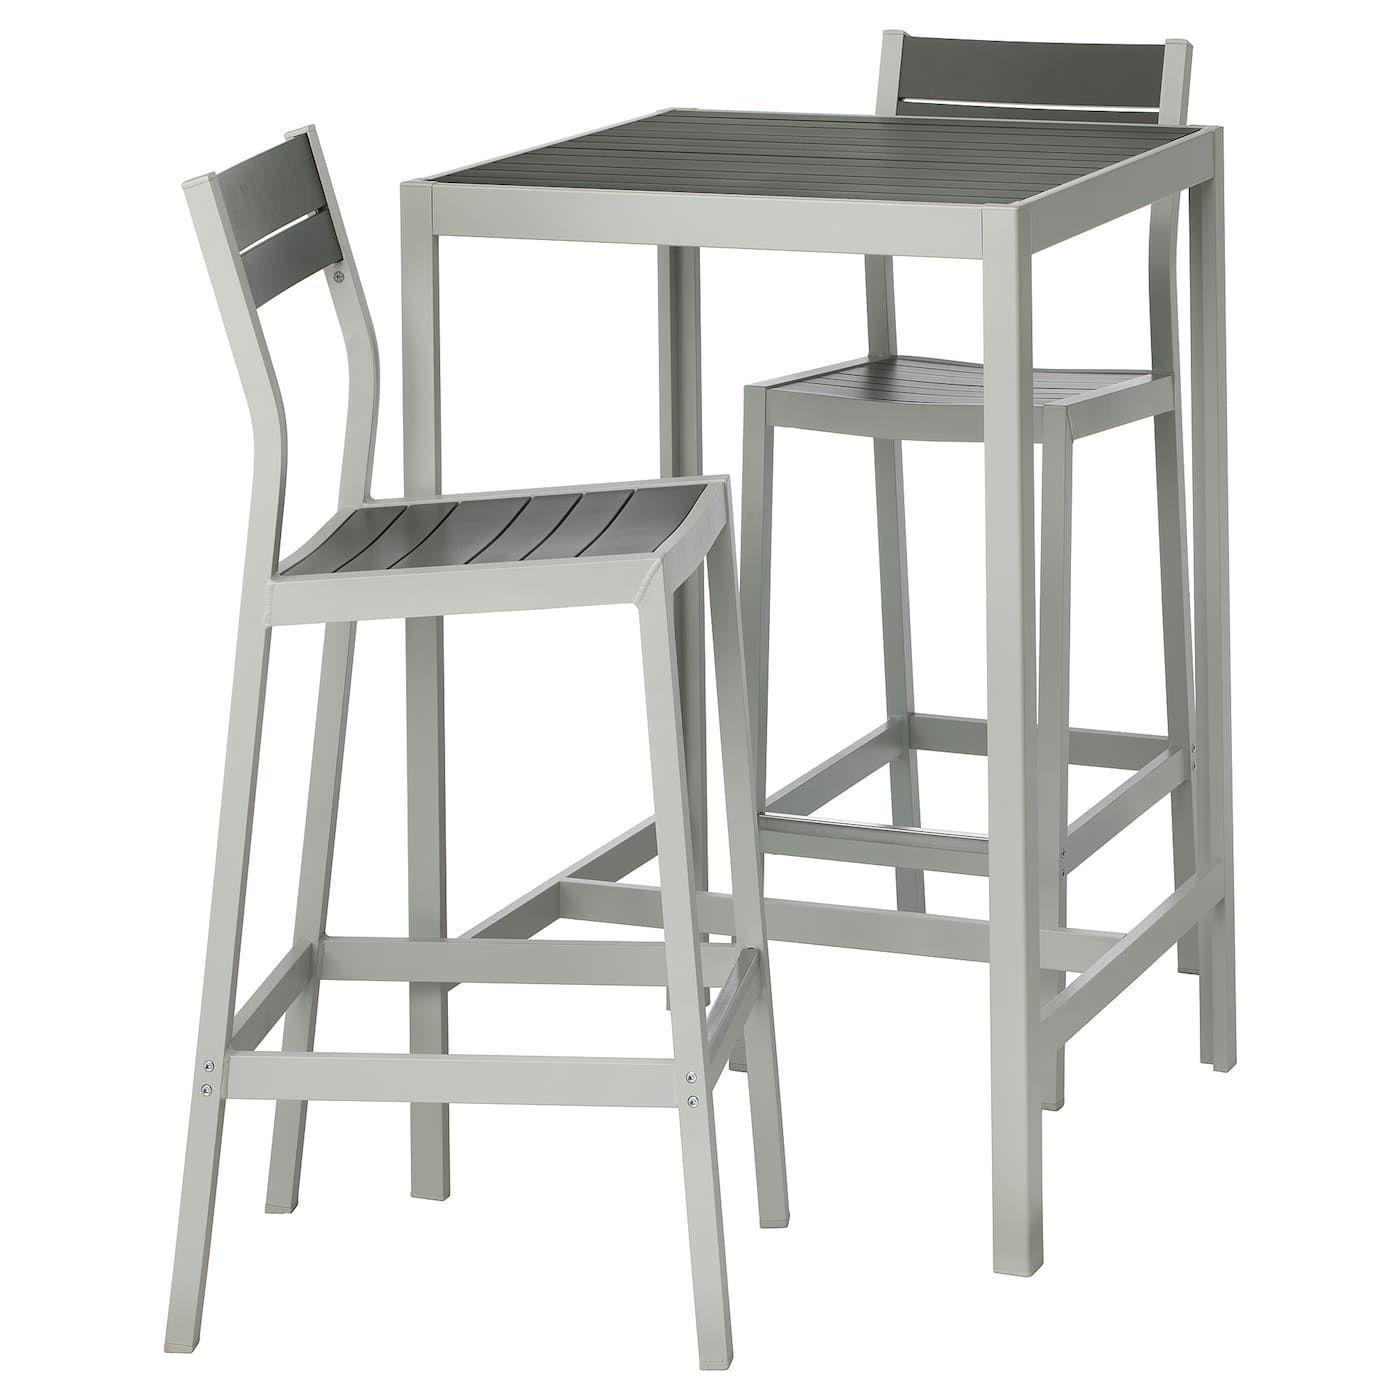 Bar Dark Gartenmobel Ikea Gray Ikea Light Outdoor Sjalland Stools Table Sjalland Bar Table And 2 Bar Stools Outdoor Dark Gray L In 2020 Landschaftsbau Bau